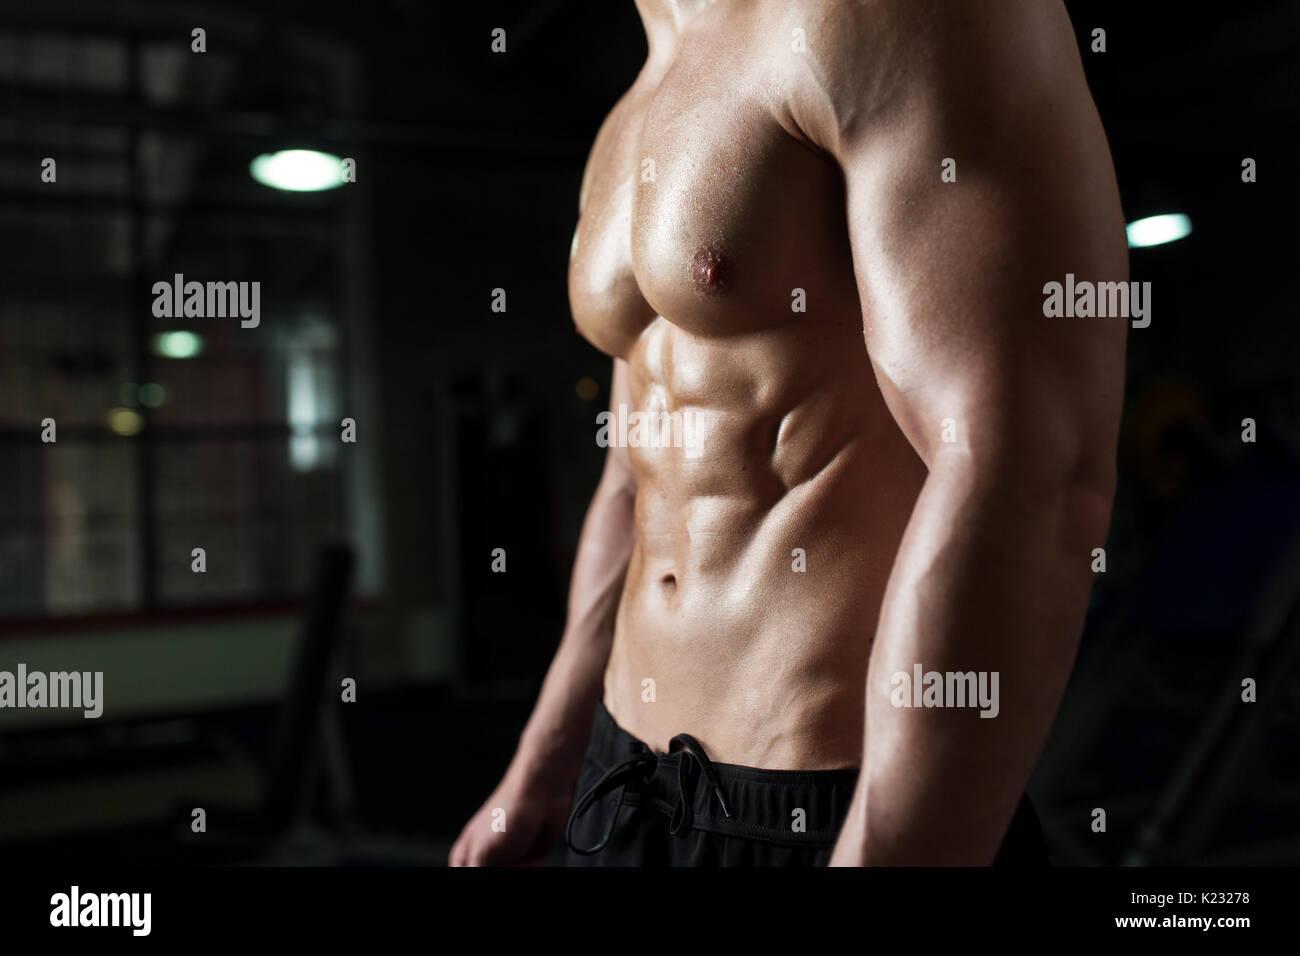 männlicher körper nackt